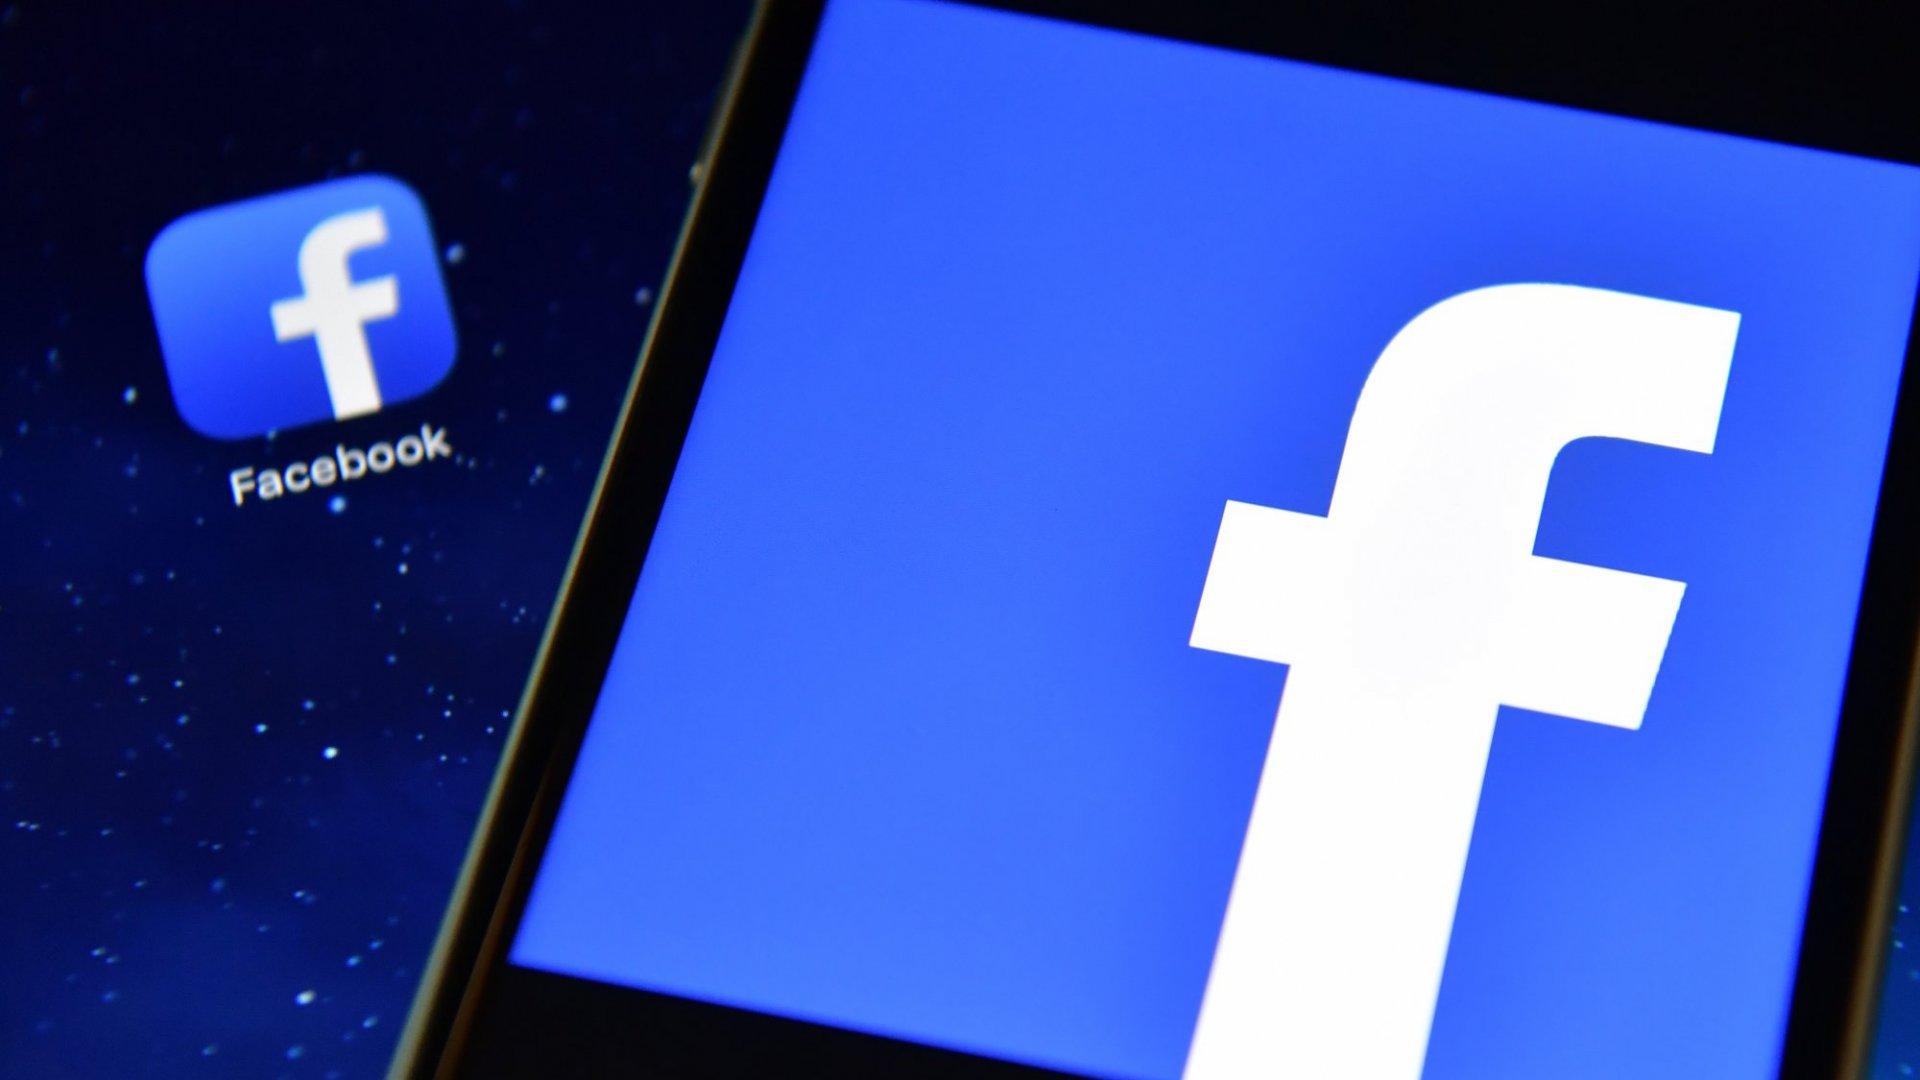 Facebook Just Made a Huge Announcement About Its Diversity Hiring Goals